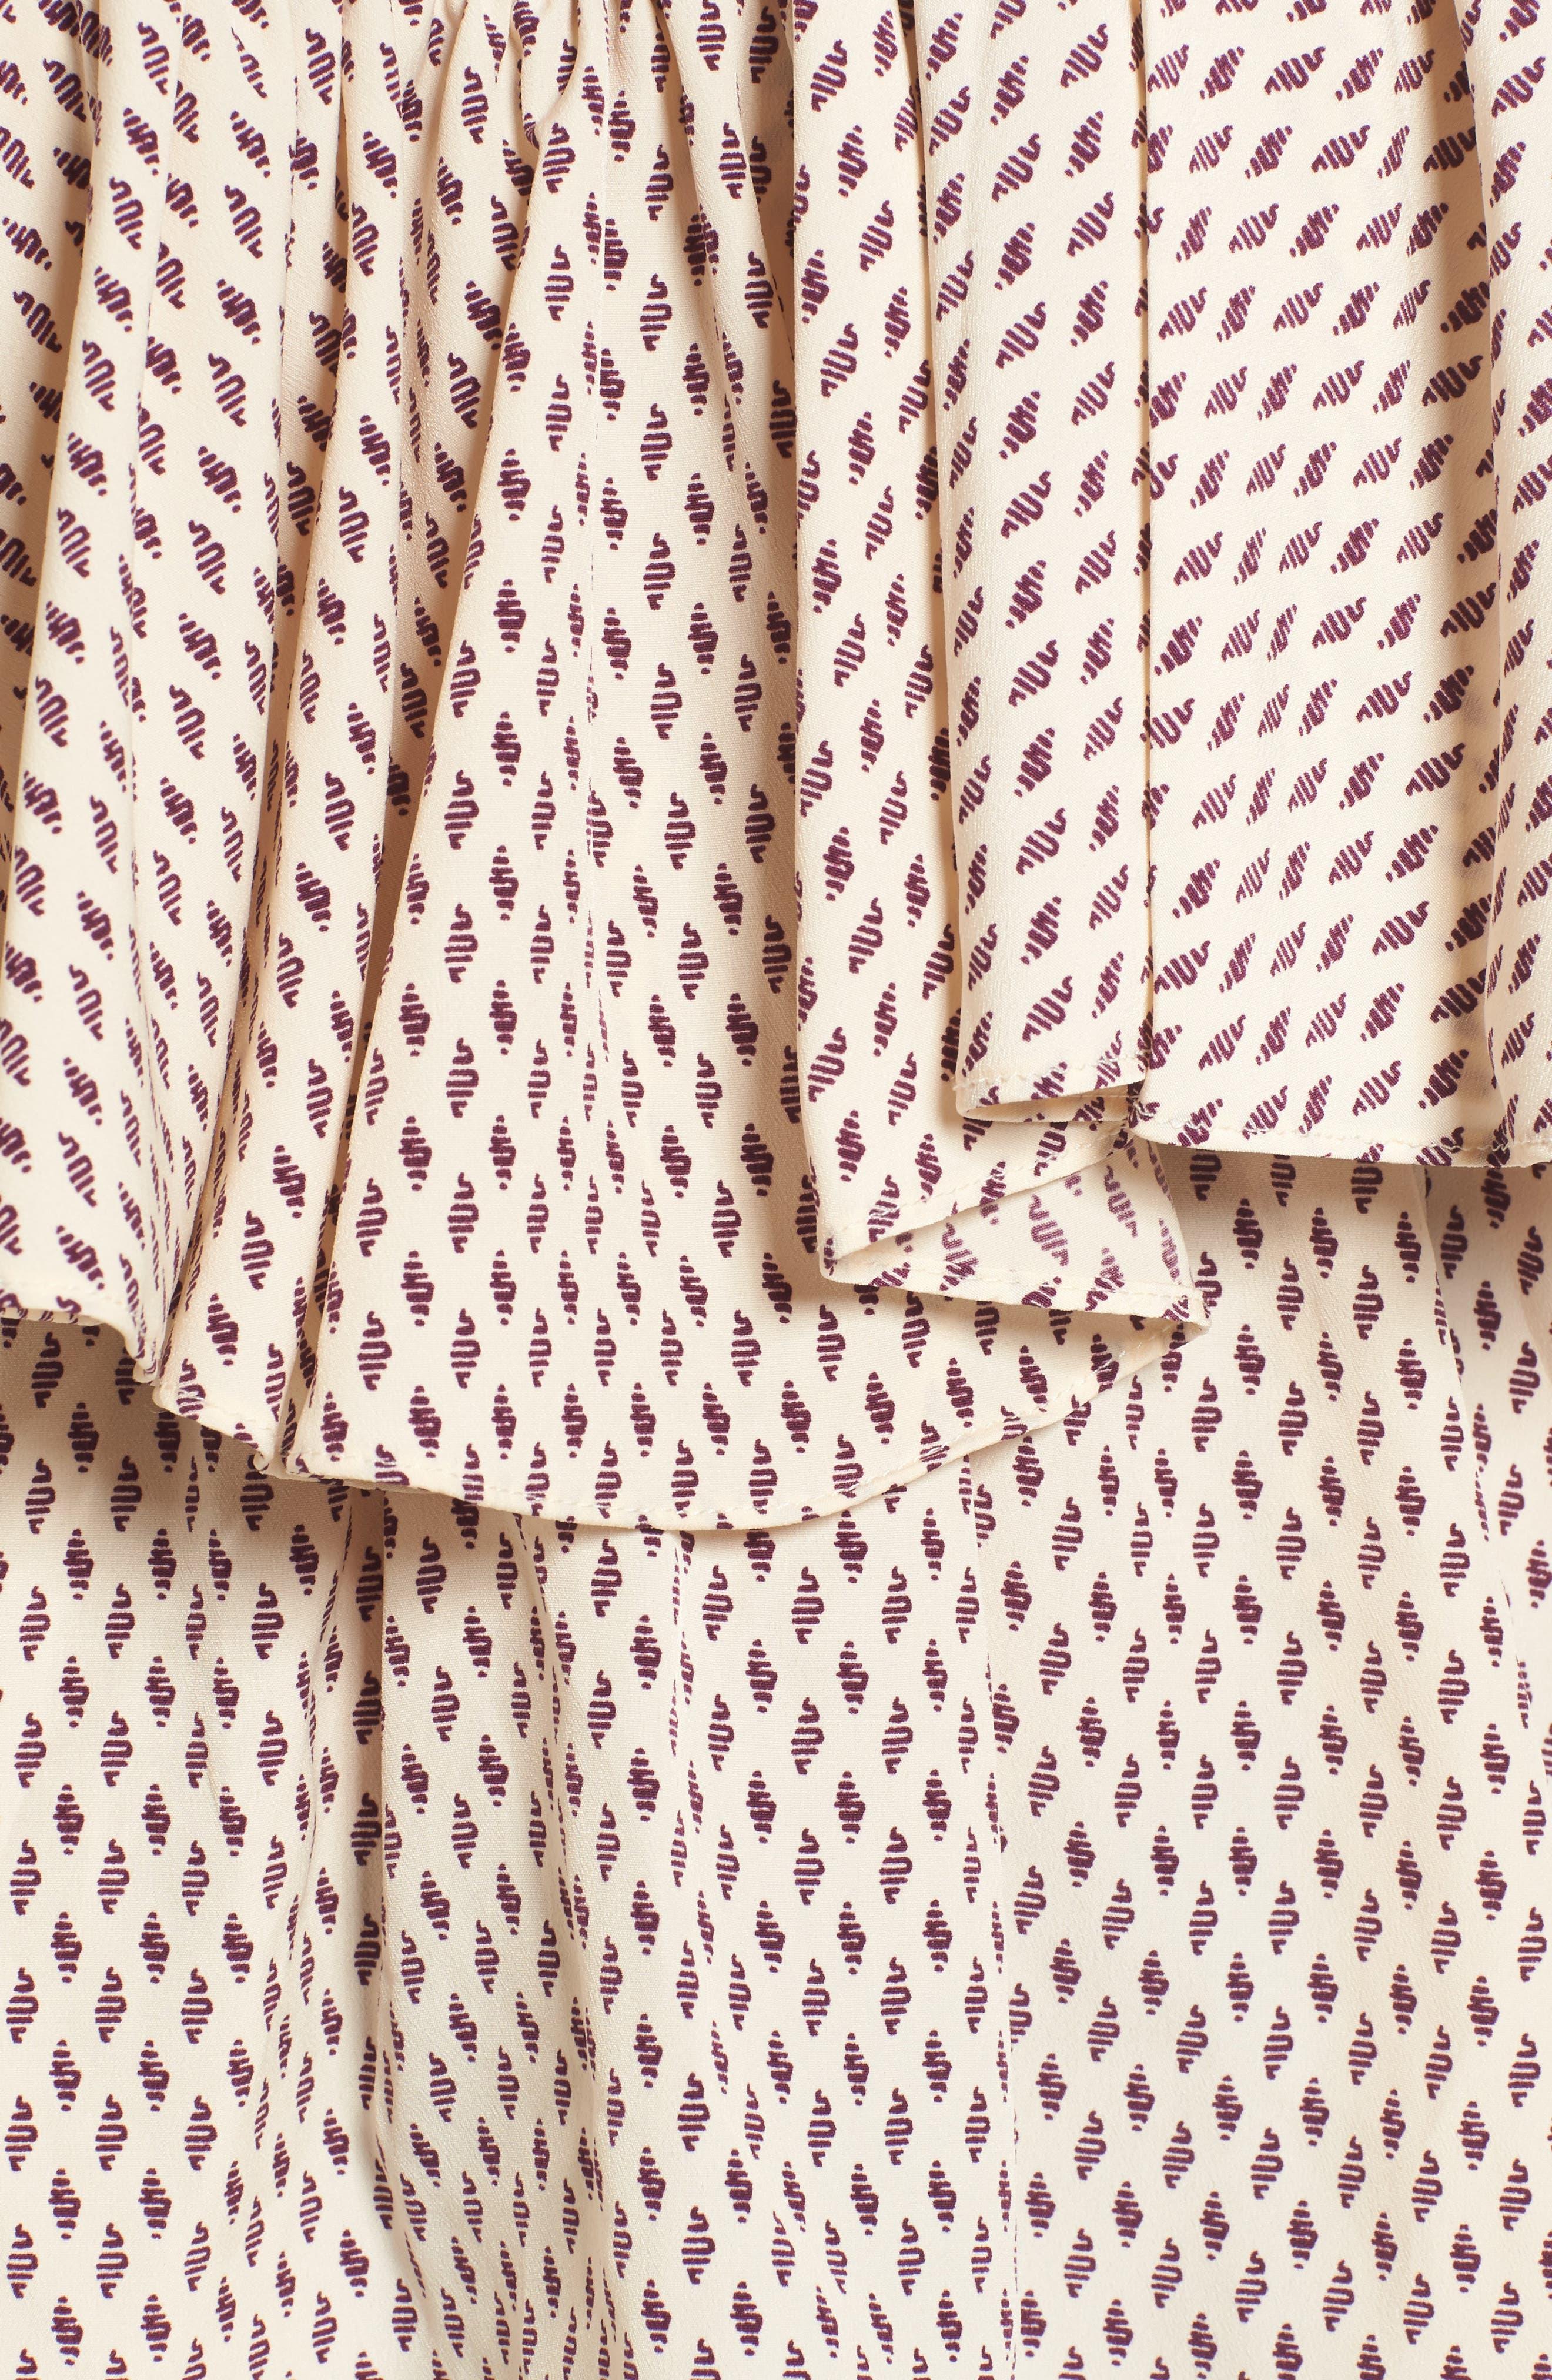 Carole Off the Shoulder Top,                             Alternate thumbnail 5, color,                             Ivory/ Burgundy